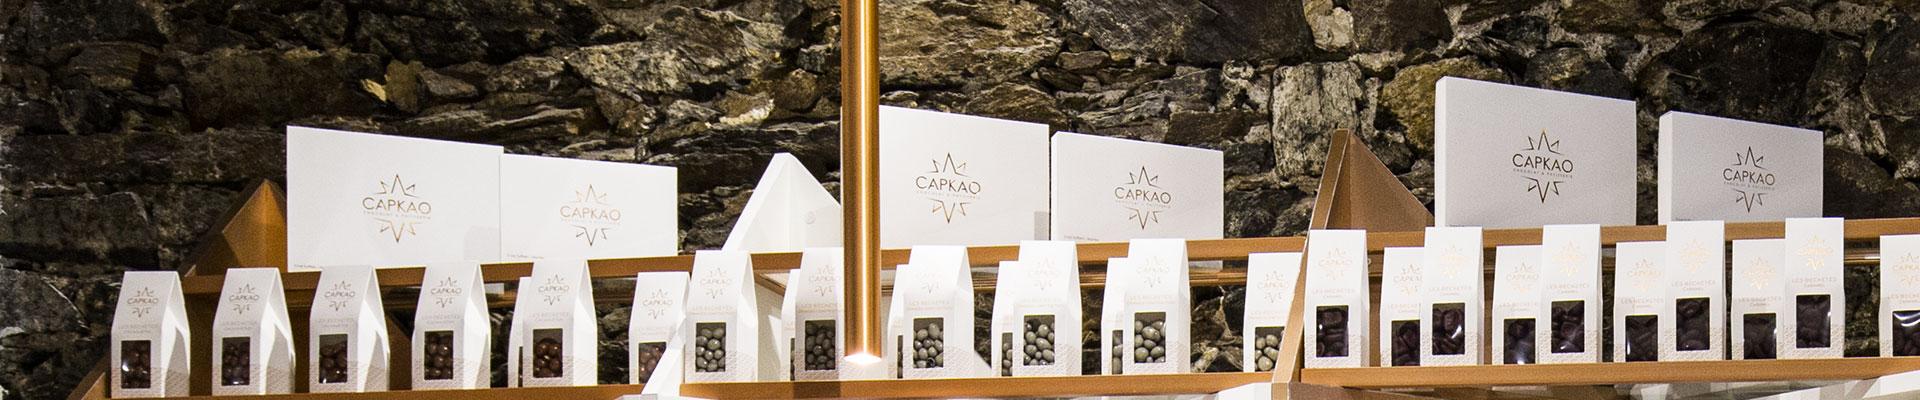 Capkao Confiserie Nantes